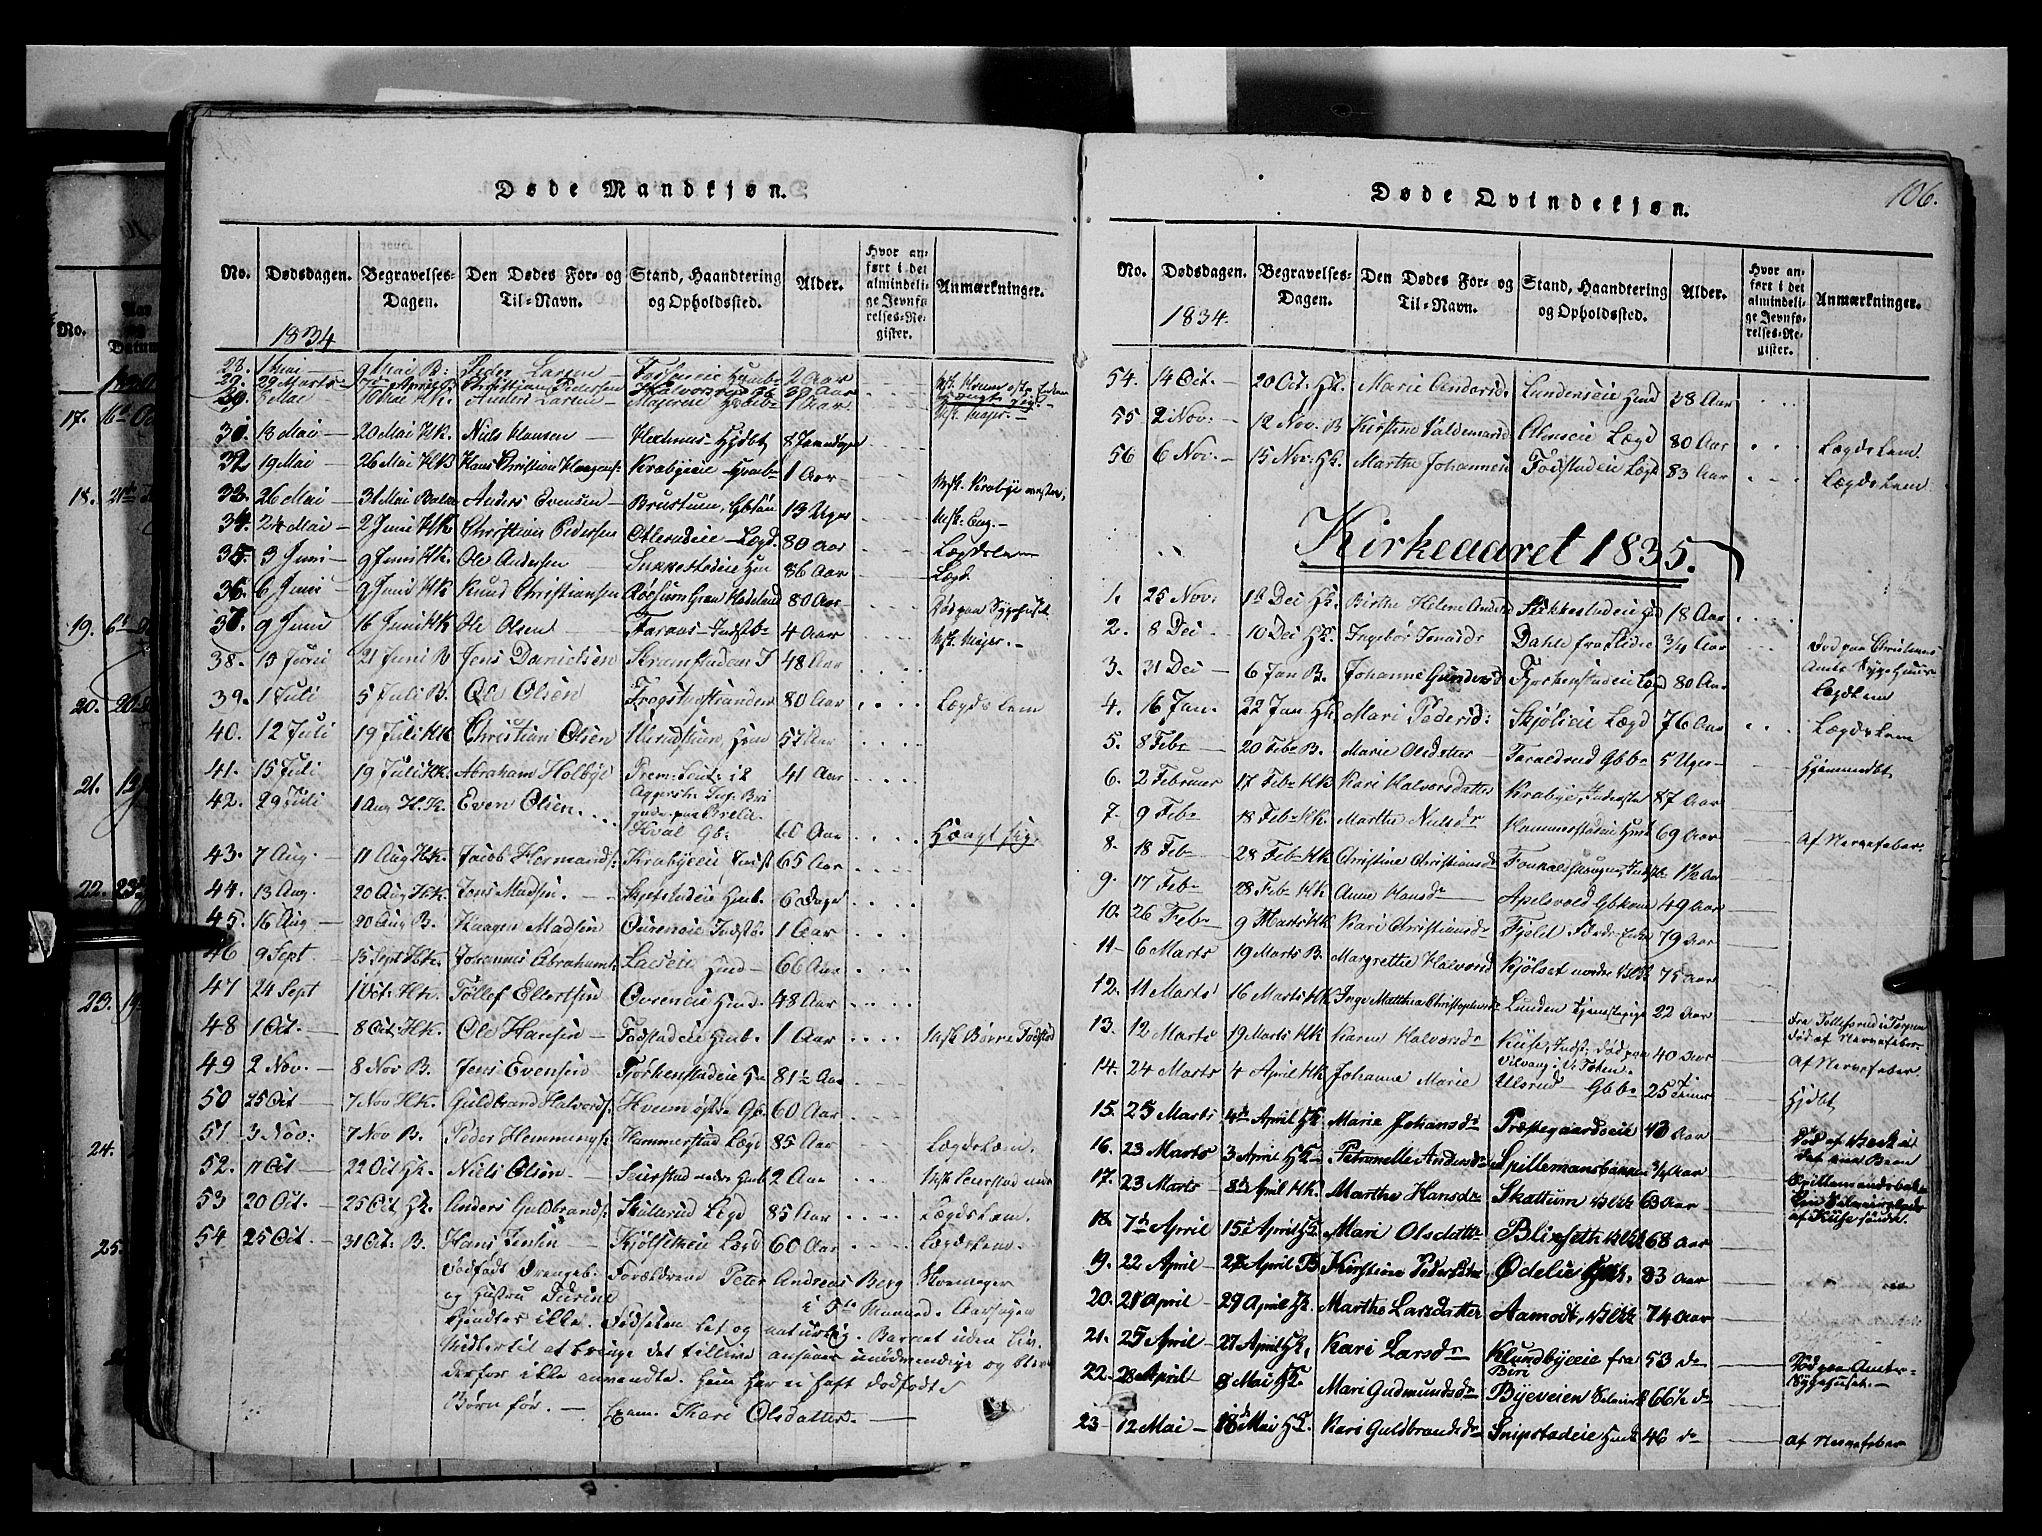 SAH, Østre Toten prestekontor, Ministerialbok nr. 1, 1828-1839, s. 106